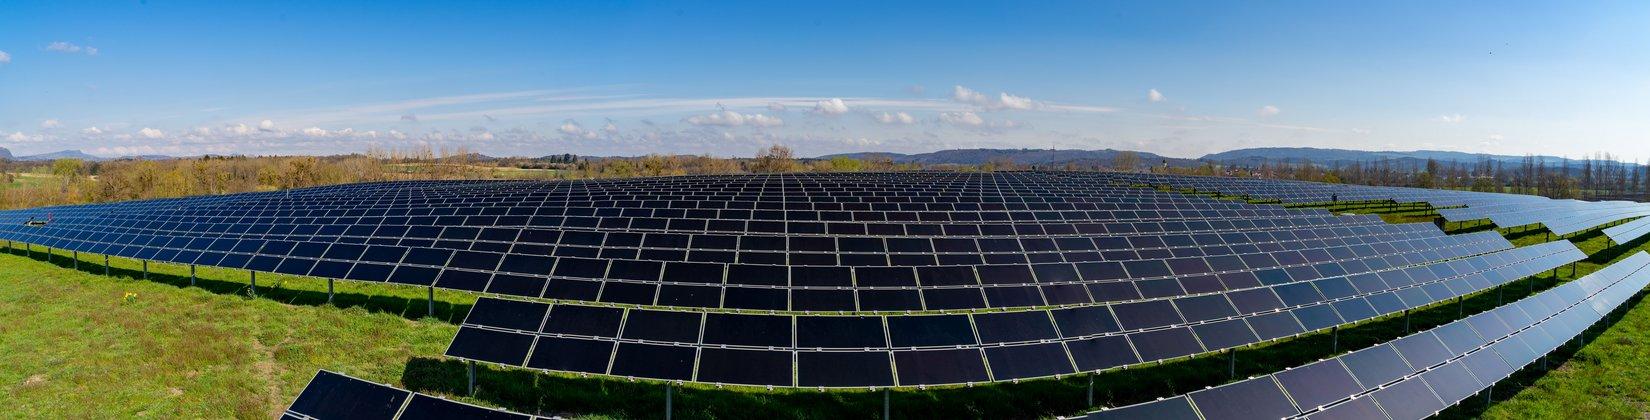 Solarpark Rickelshausen ©Plattform EE BW, A. Jung